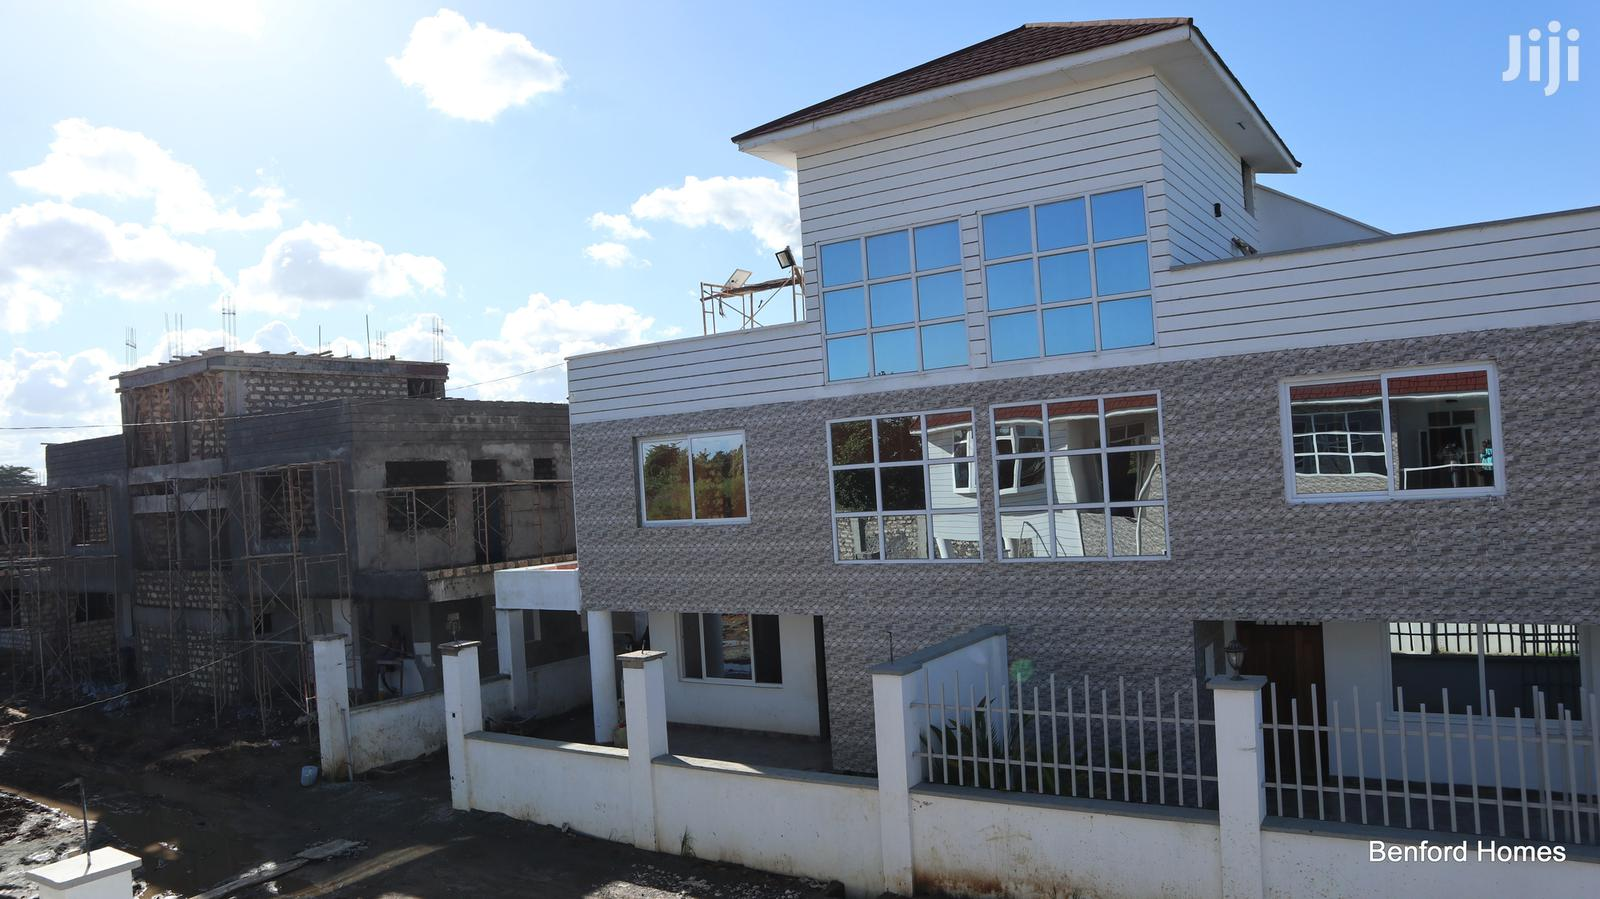 4br Townhouse On Sale Bamburi/ Benford Homes